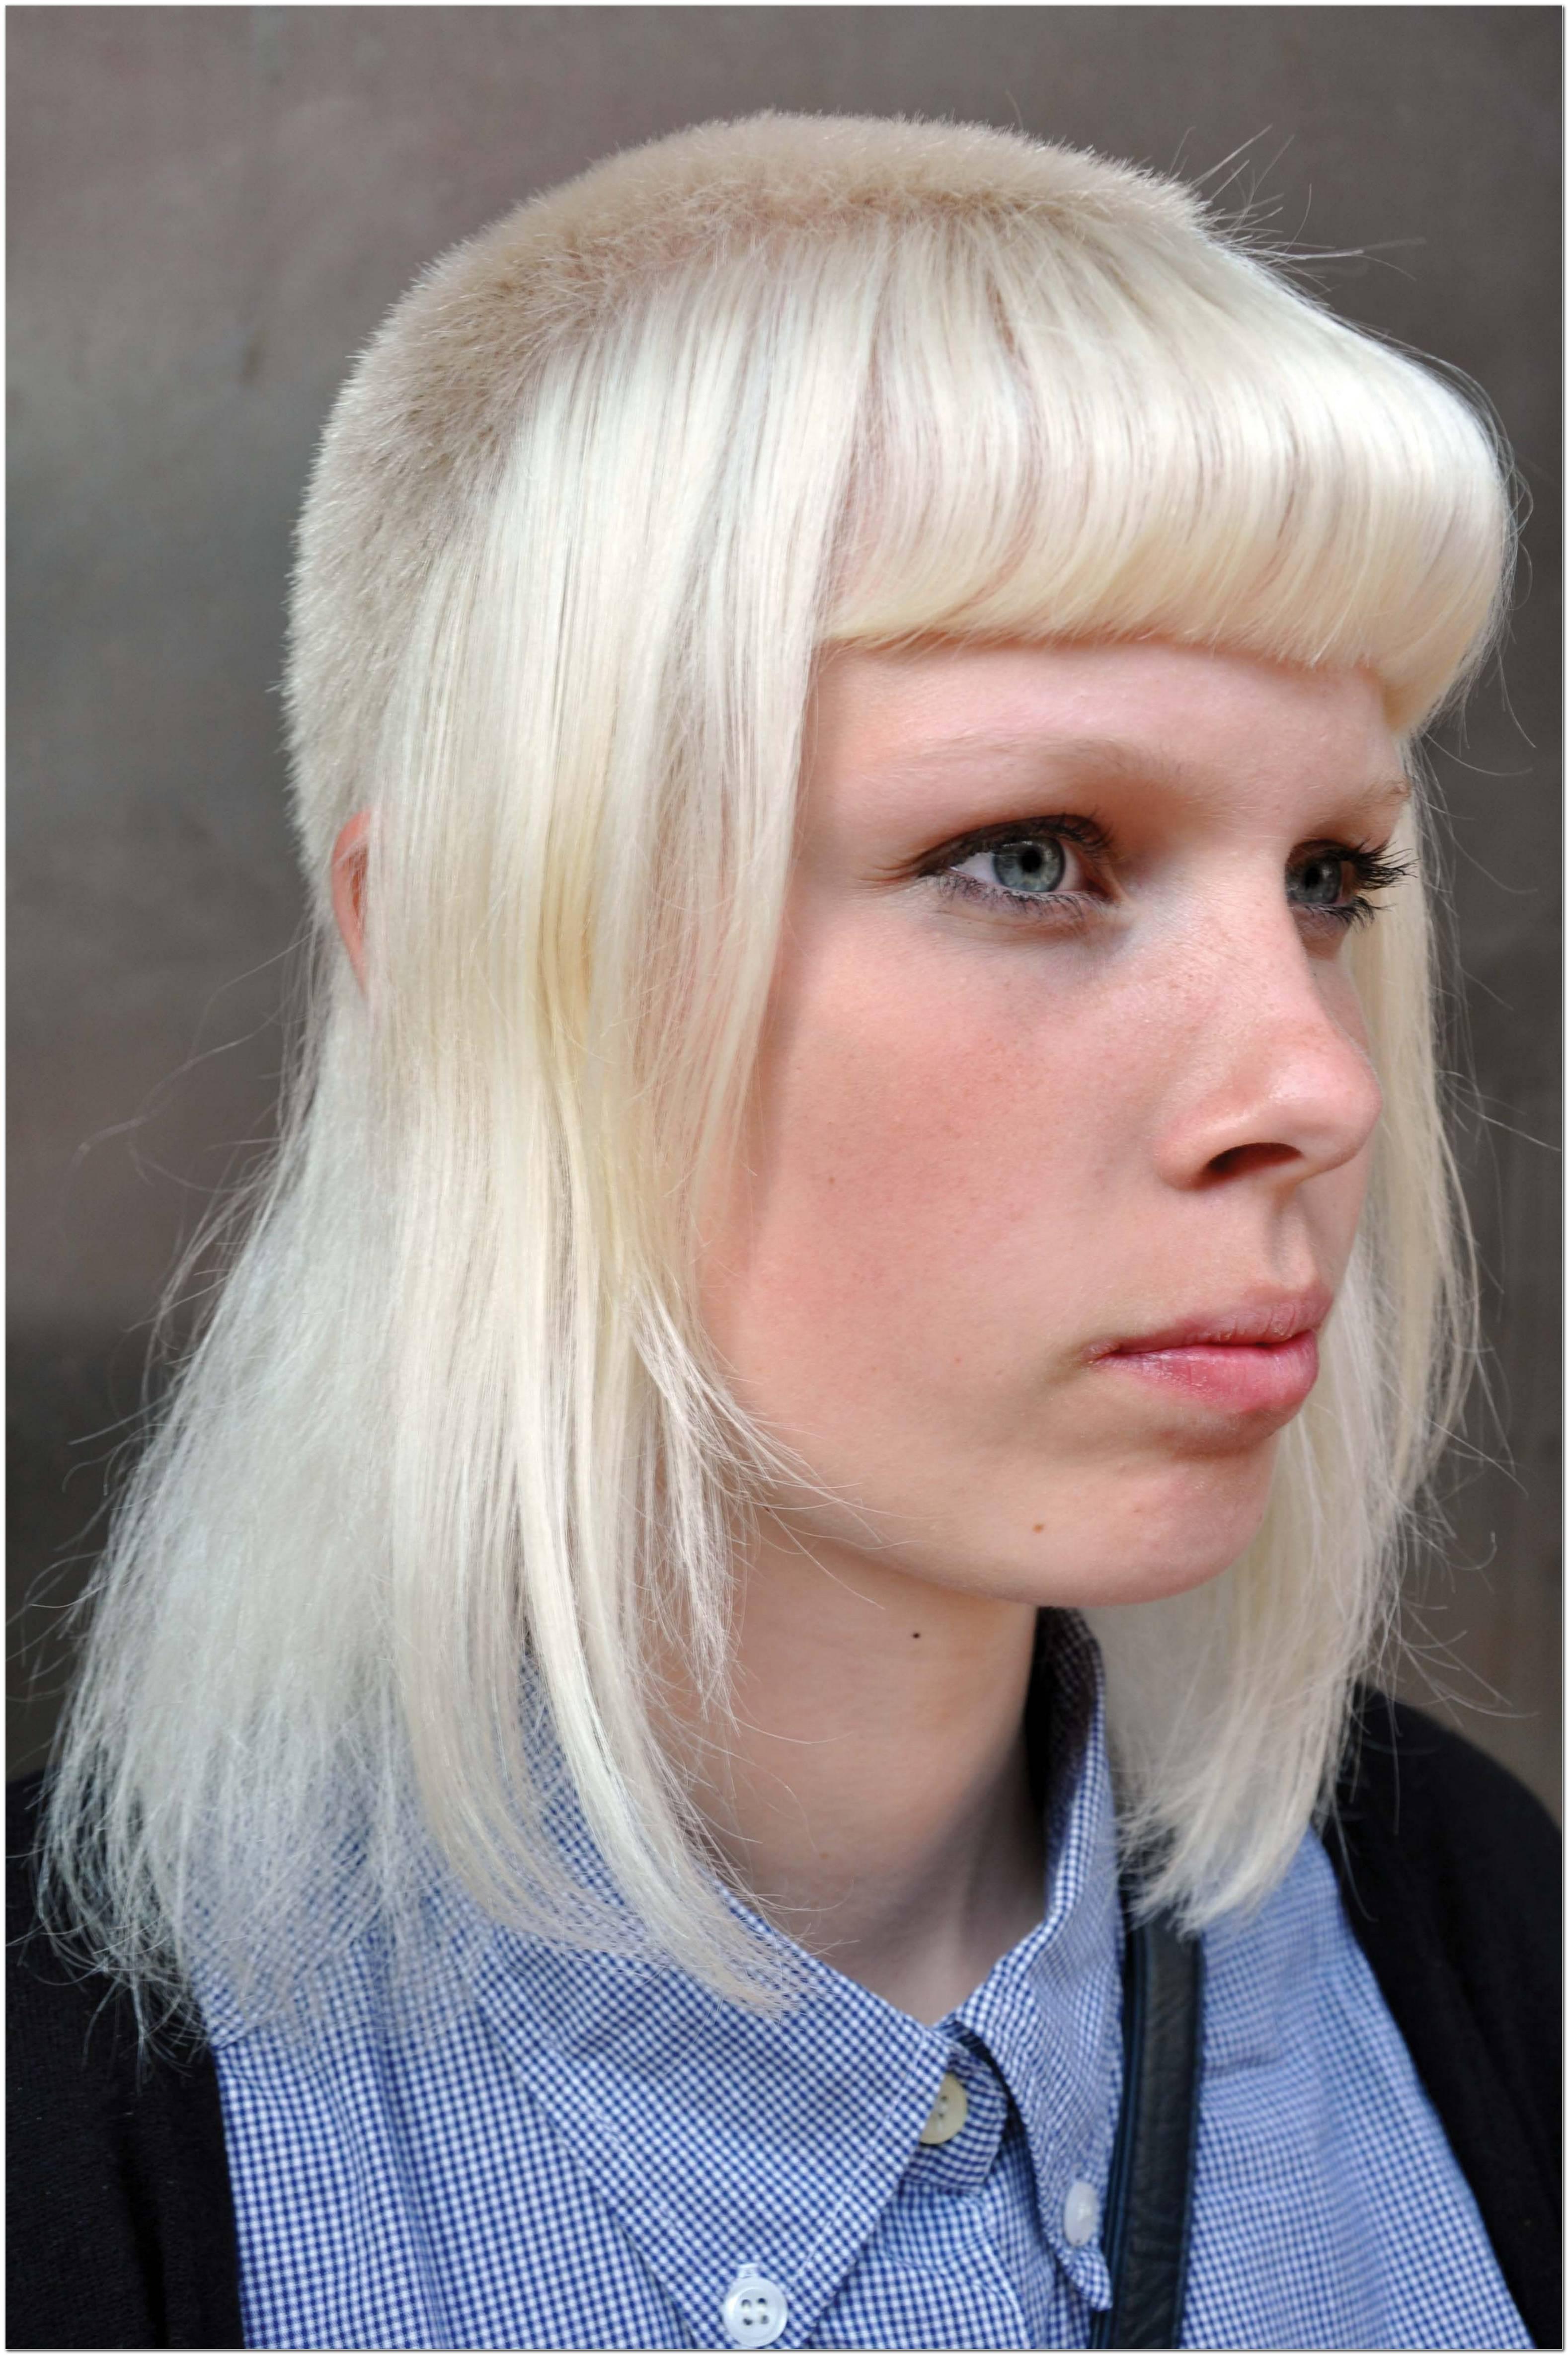 Skinhead Frisur Frauen